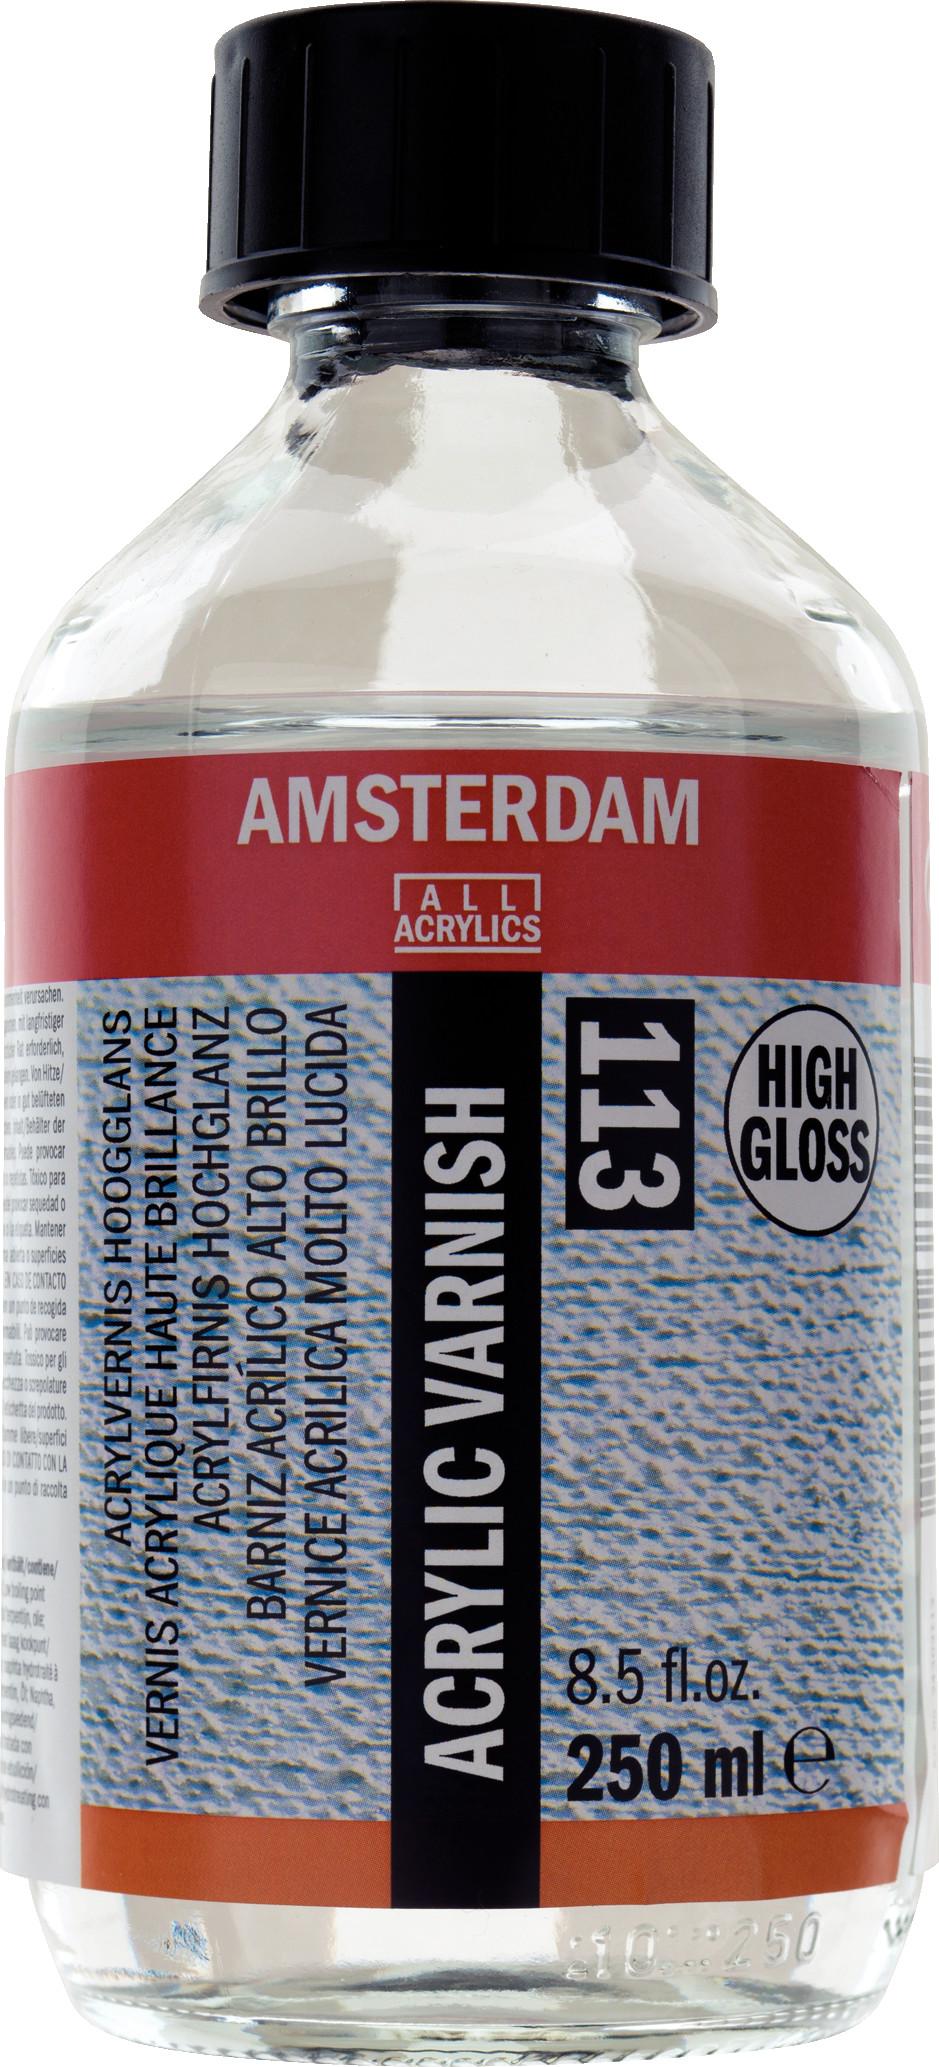 Amsterdam Acrylic Varnish High Gloss Bottle 250 ml